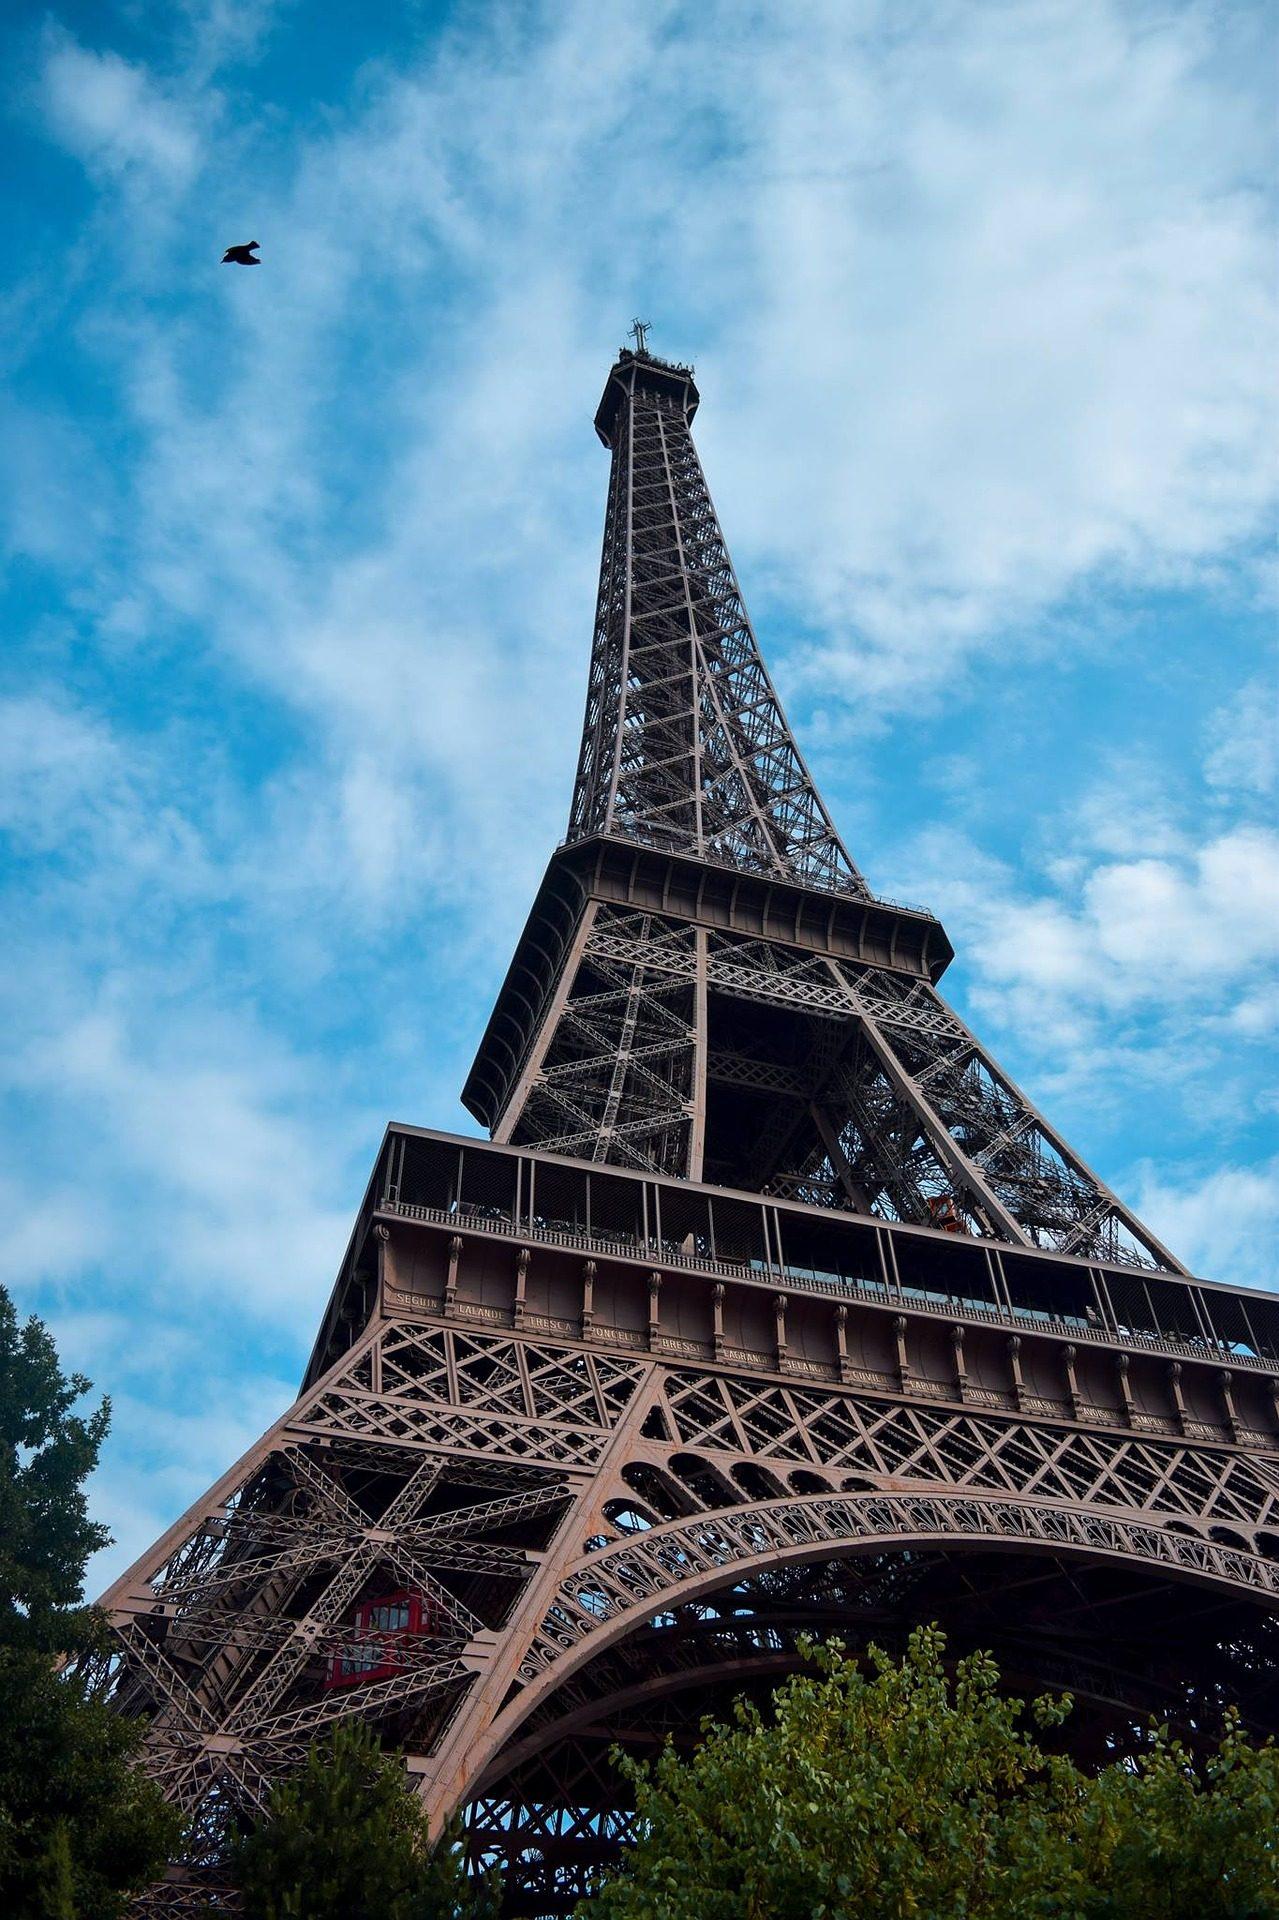 Torre, Eifel, Monumento, altura, Paris - Papéis de parede HD - Professor-falken.com